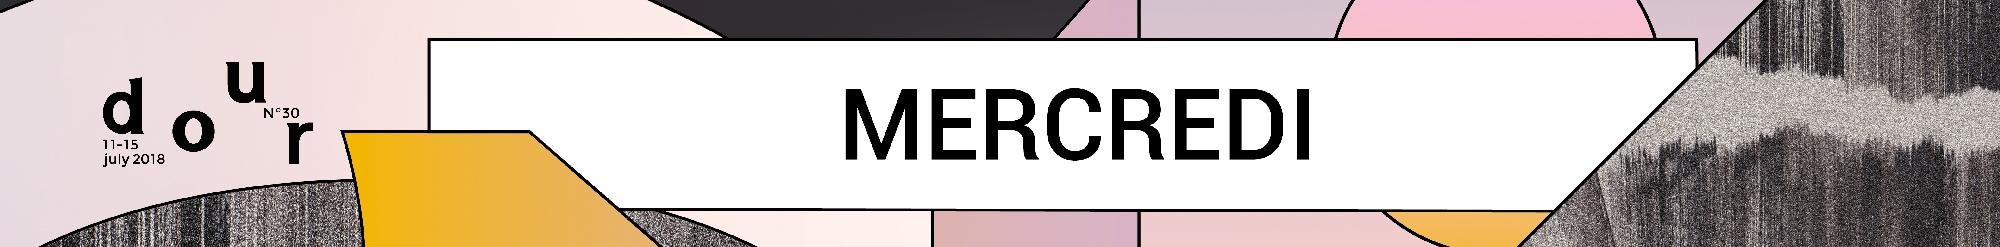 BANNER MERCREDI